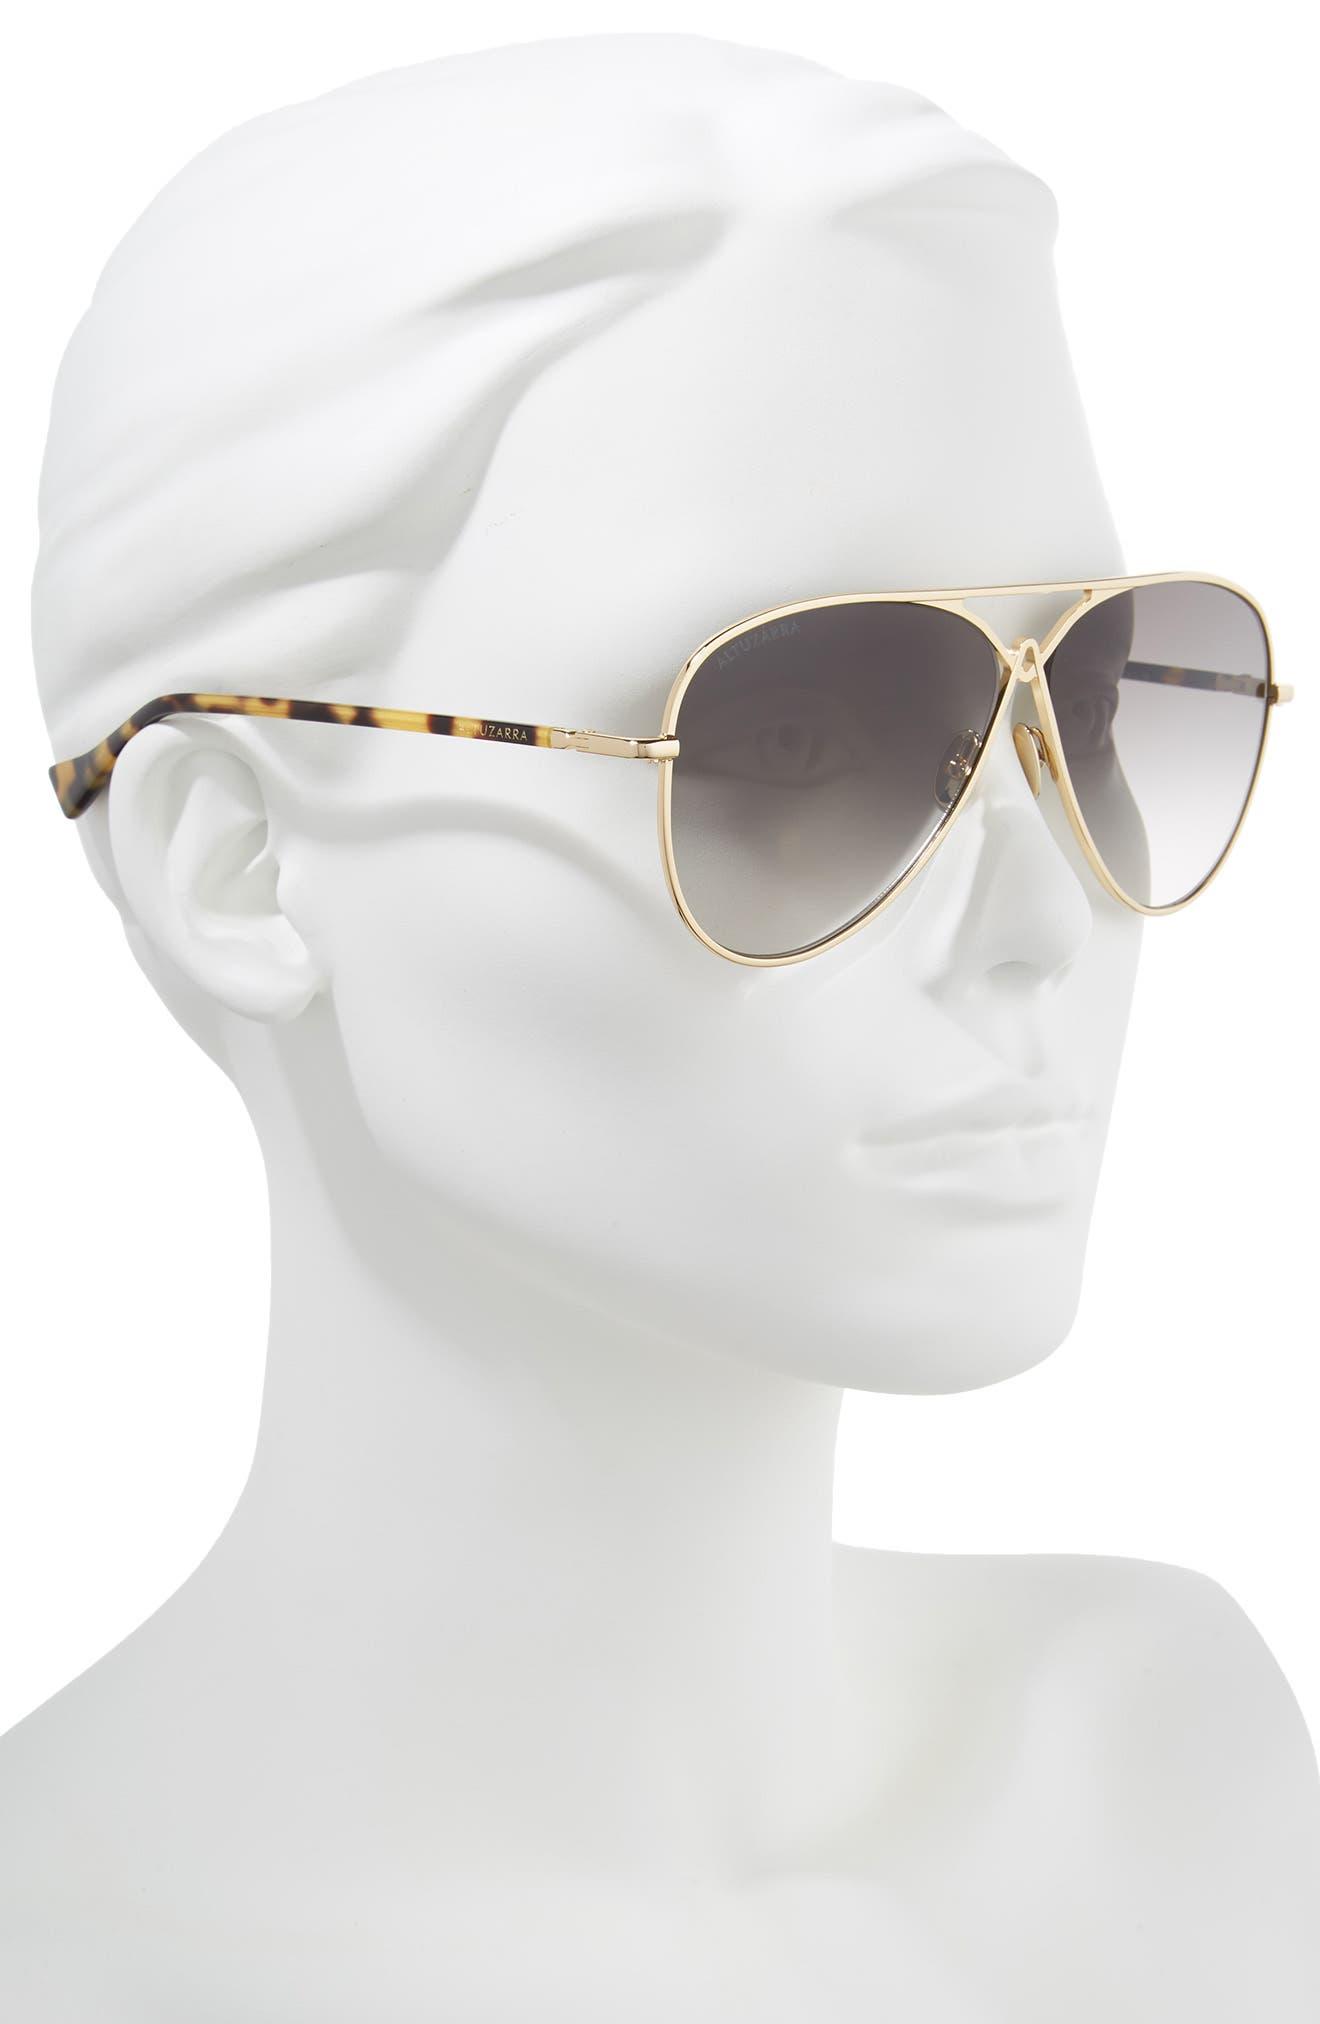 60mm Metal Aviator Sunglasses,                             Alternate thumbnail 2, color,                             Gold